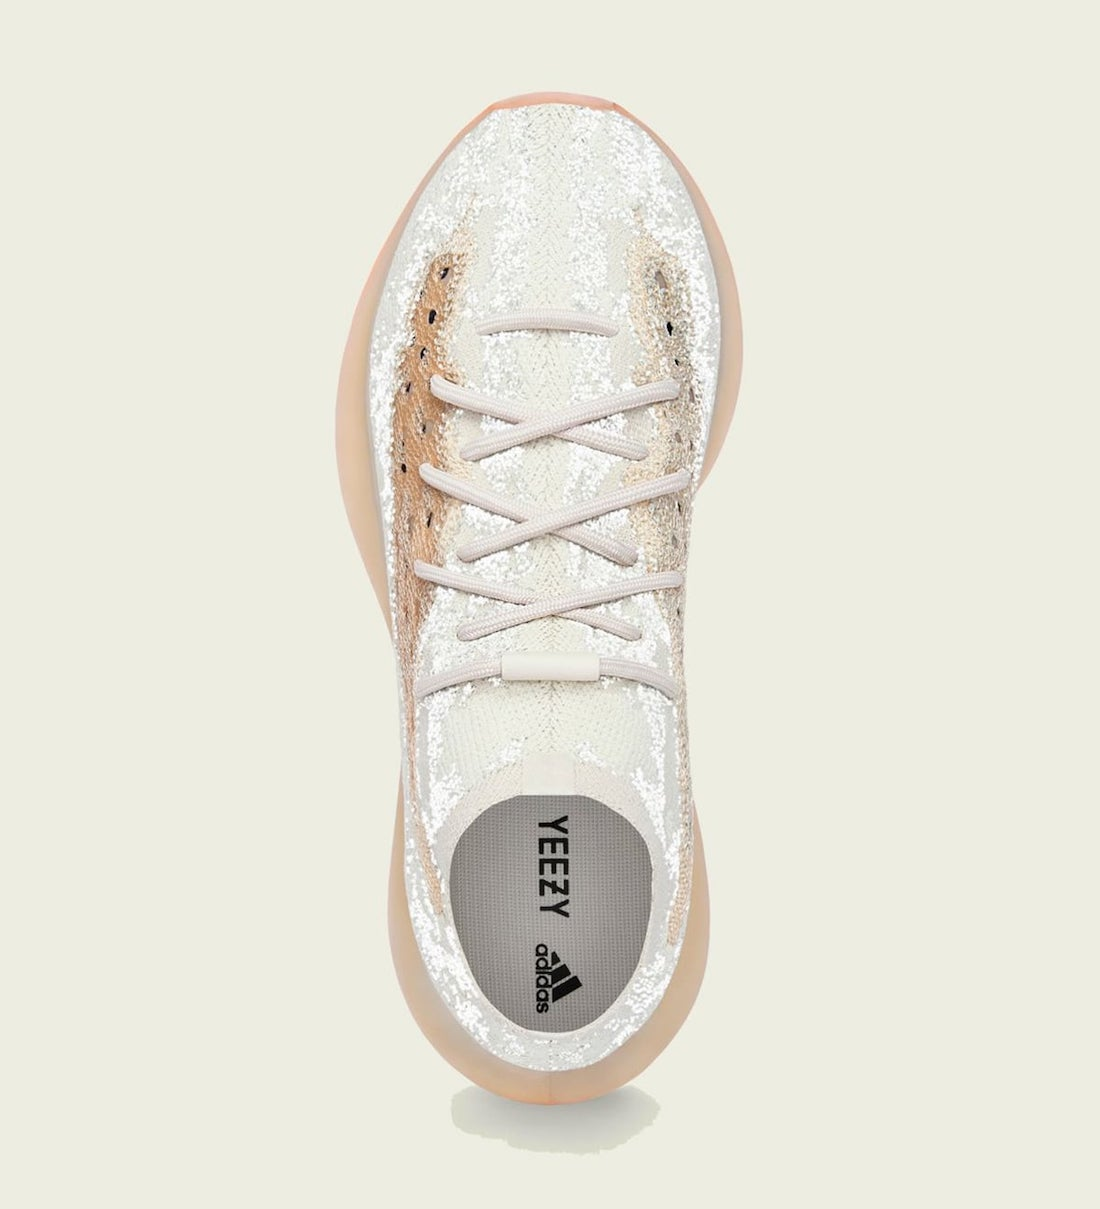 adidas Yeezy Boost 380 Yecoraite GY2649 Release Info